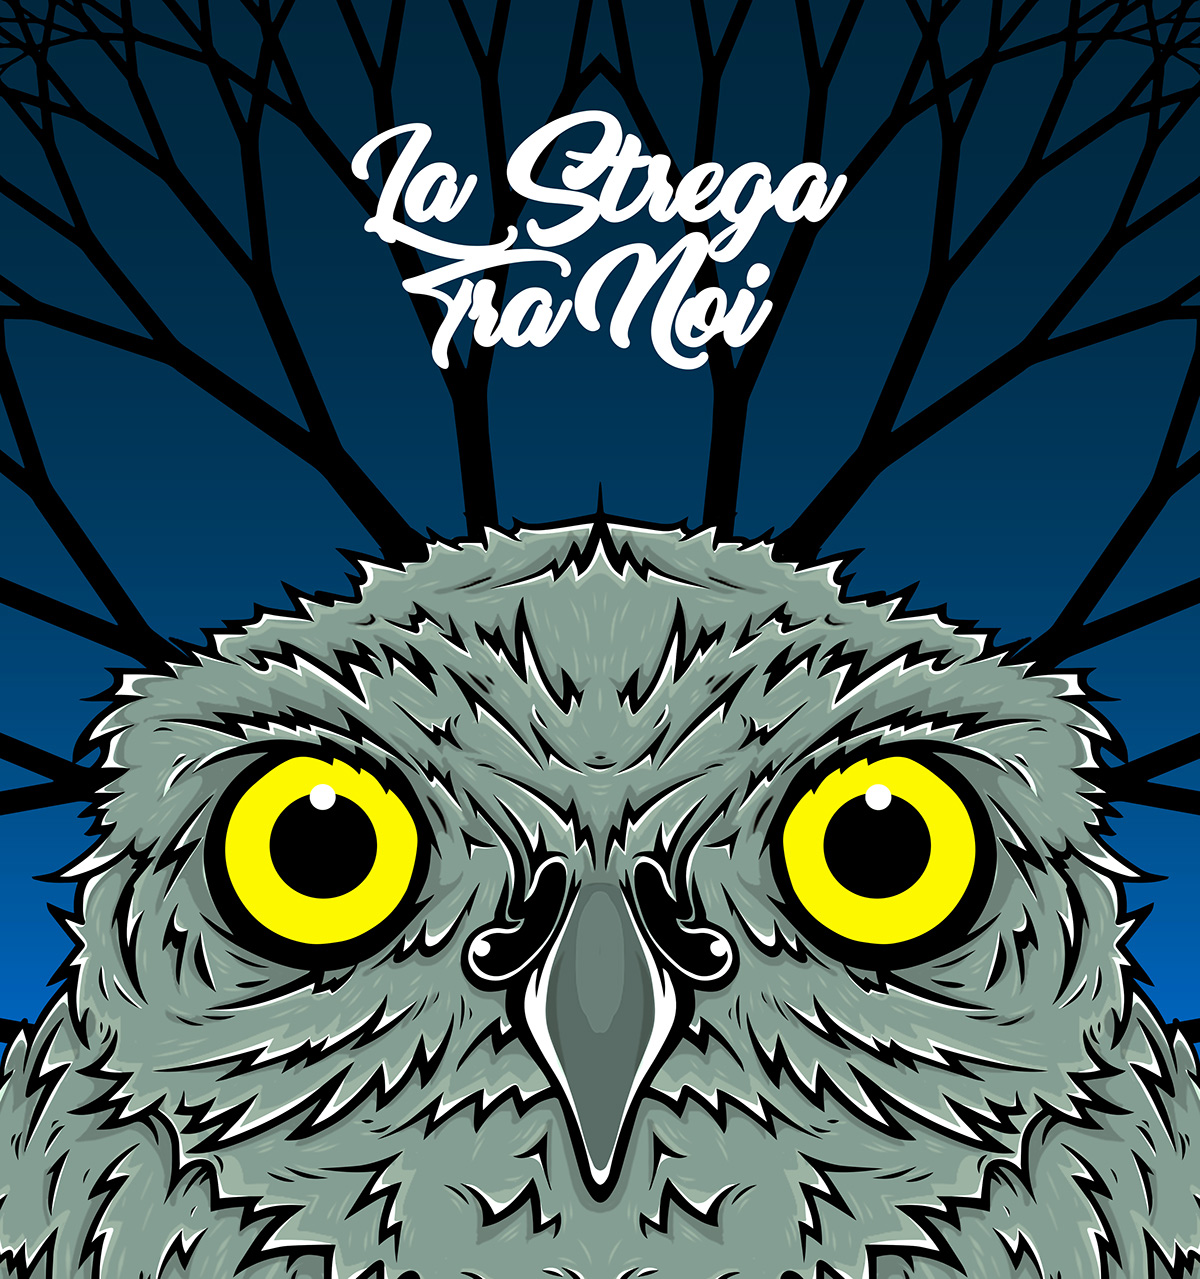 owl witch strega civetta eyes nightwatch eyelight Enzo Benedetto joythevision